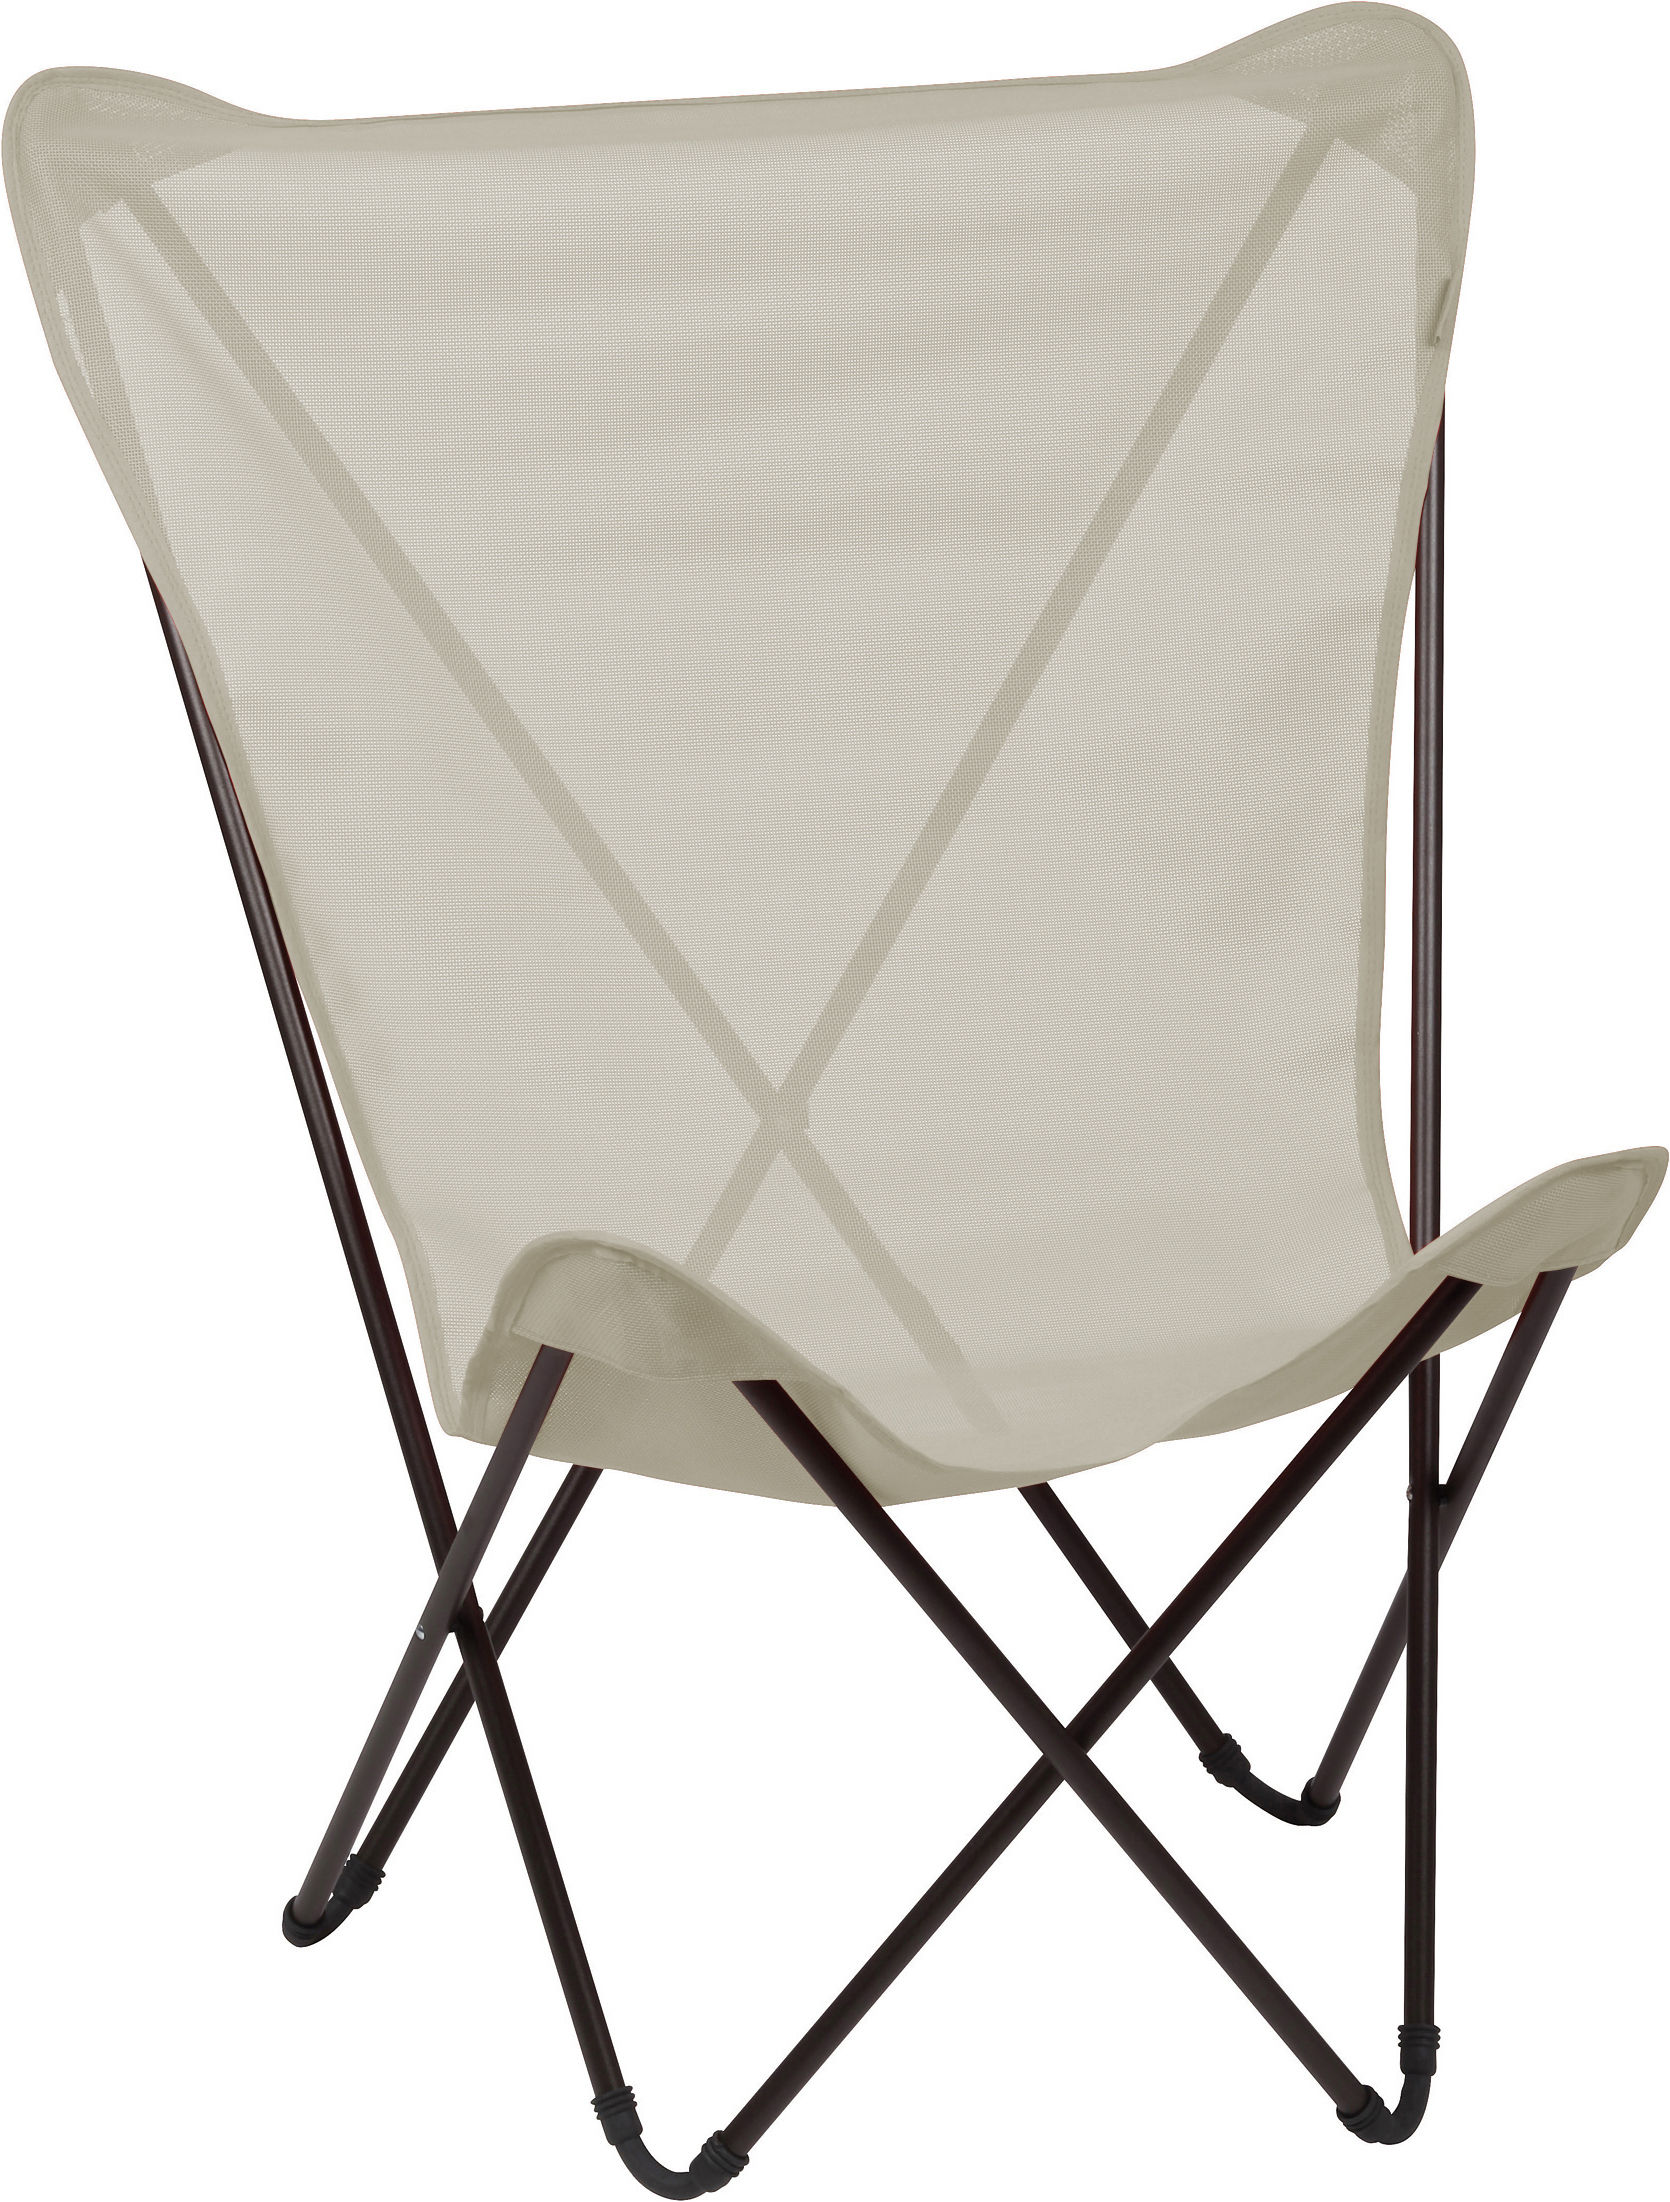 Toile de rechange pour fauteuil maxi pop up seigle lafuma - Fauteuil lafuma pop up ...